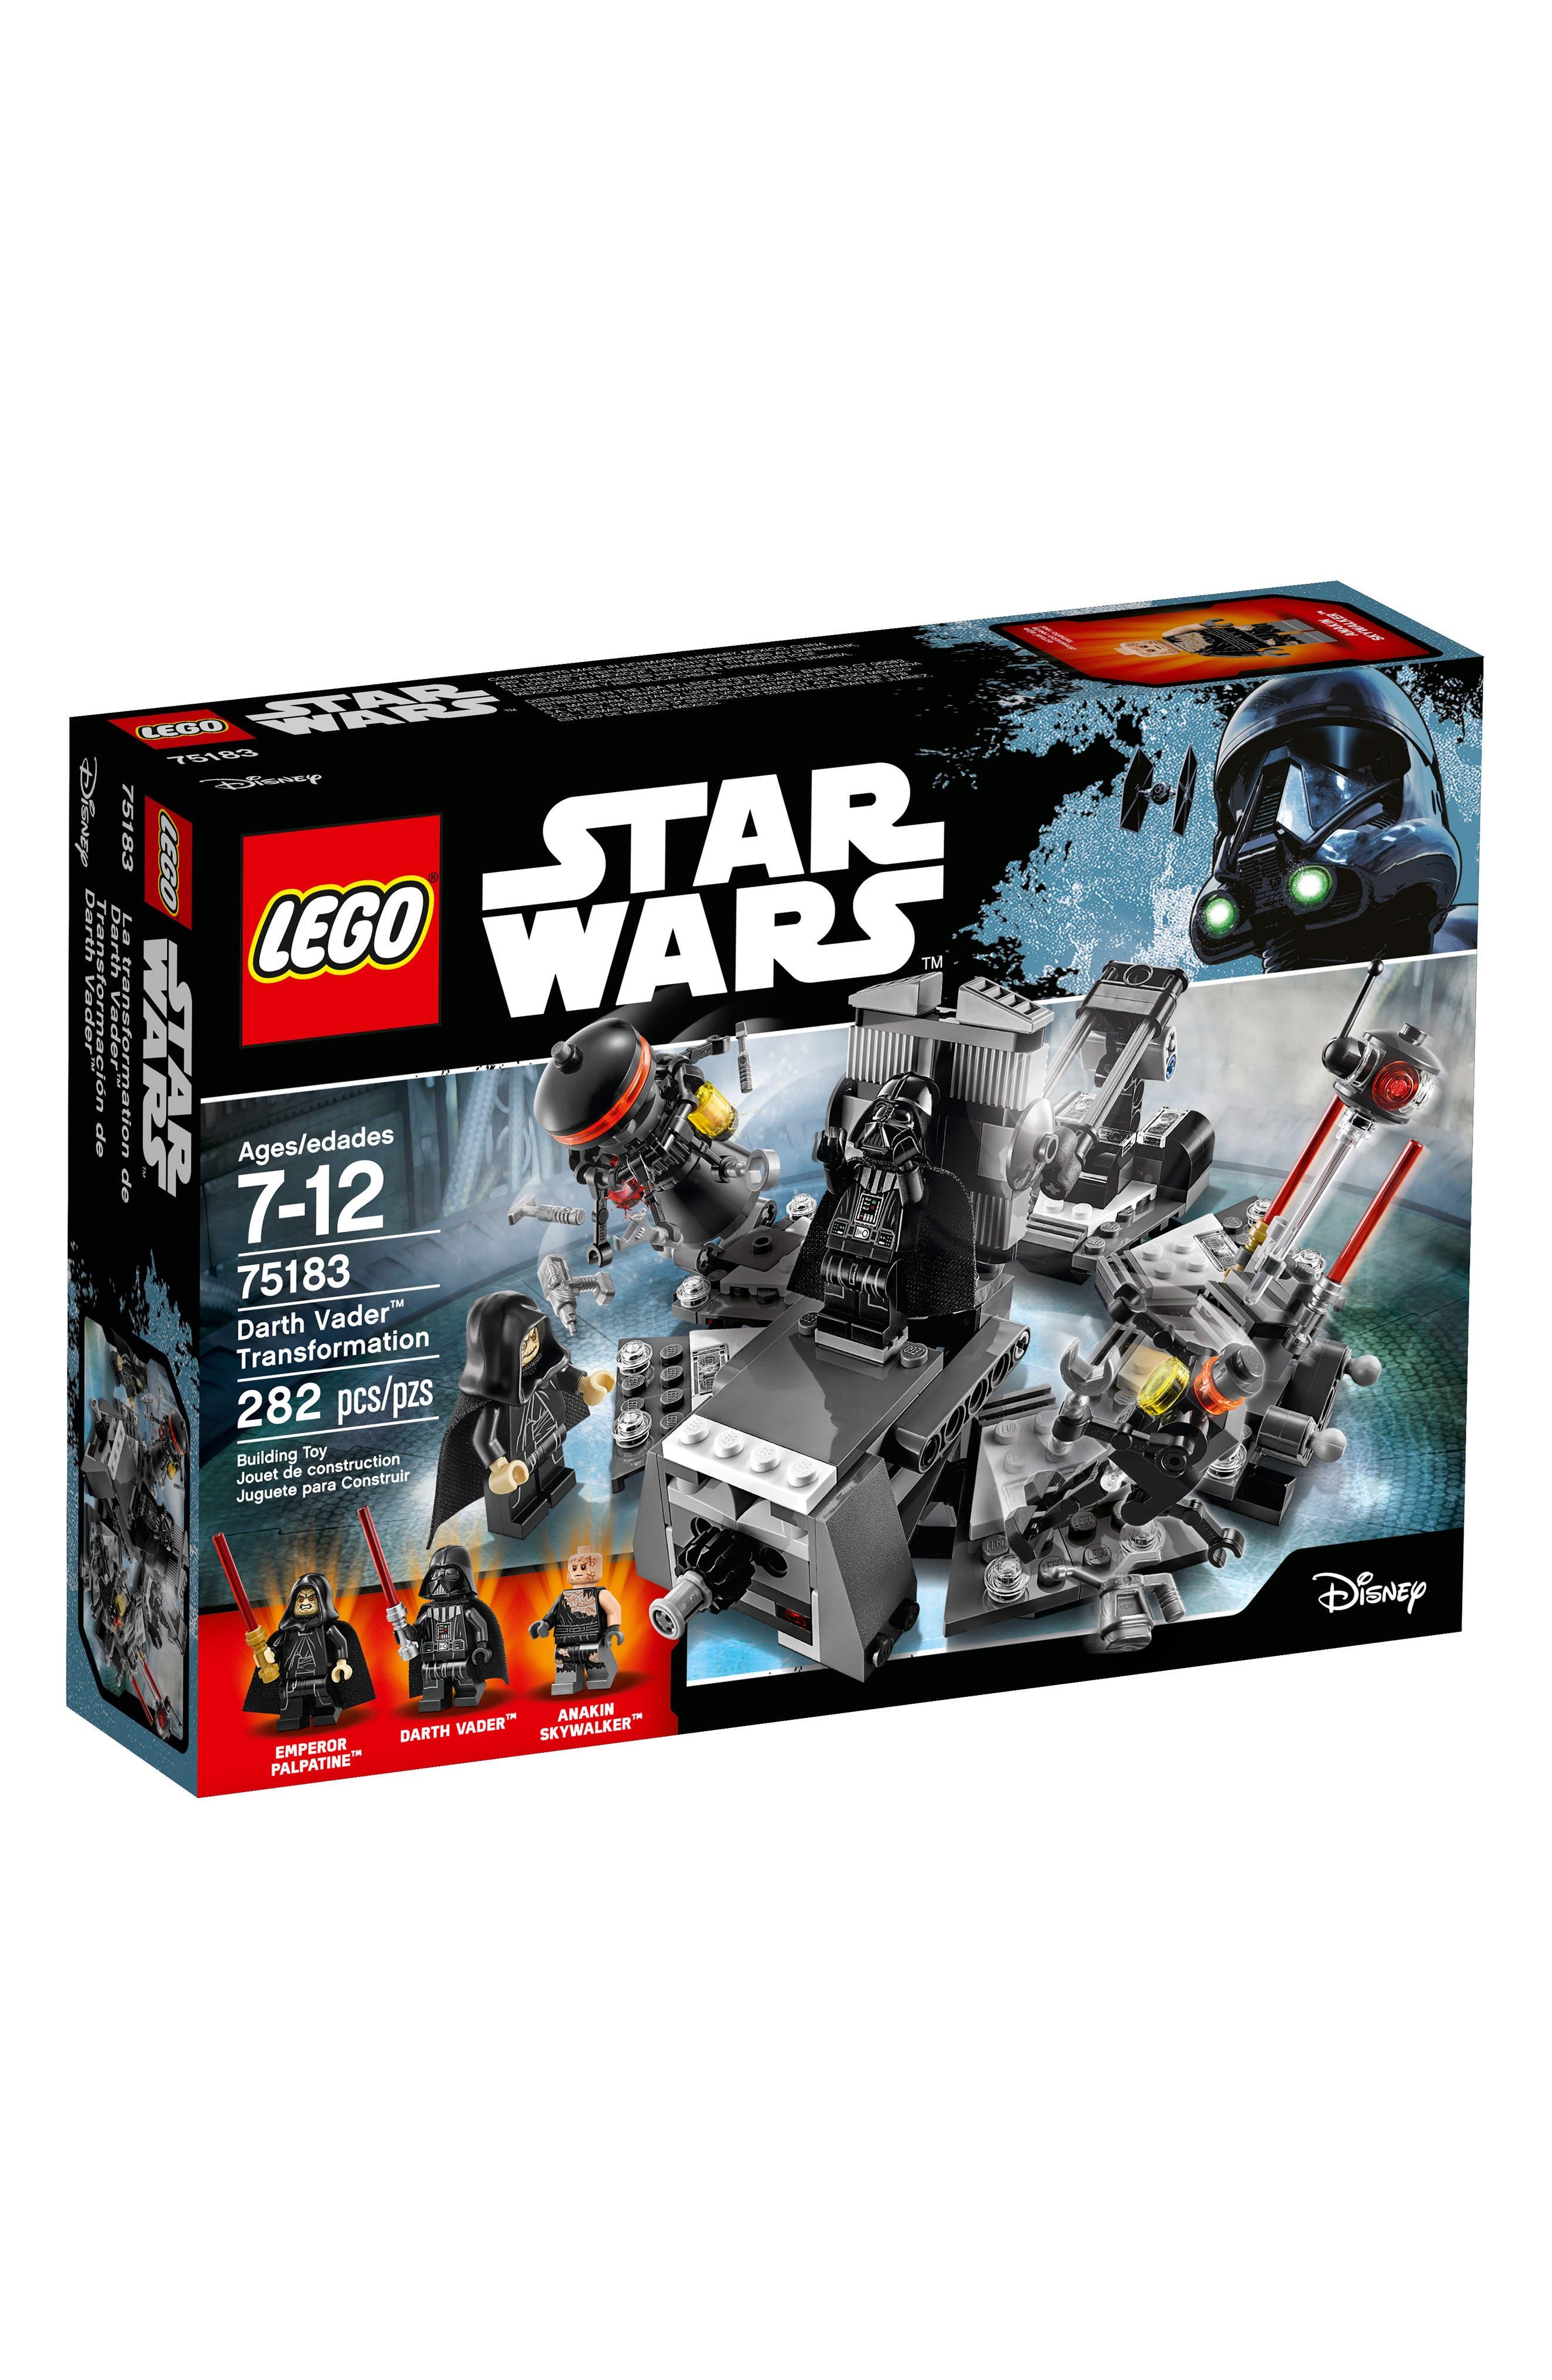 Star Wars<sup>™</sup> Revenge of the Sith Darth Vader Transformation - 75183,                             Main thumbnail 1, color,                             020